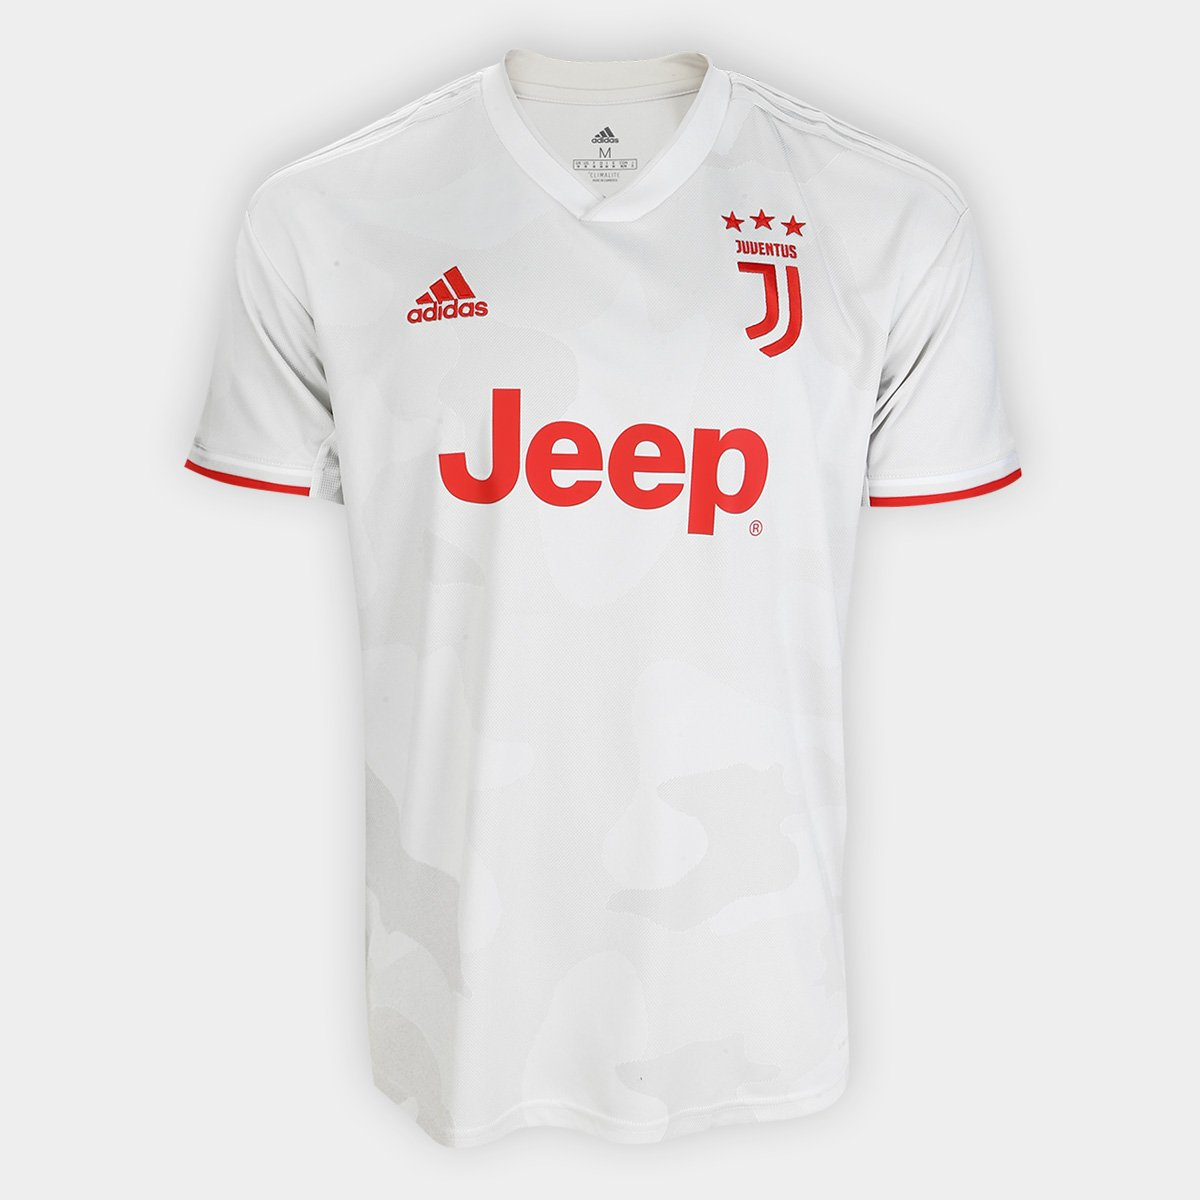 Camisa Juventus 😱😱 Produtos 💯% Originais 🔝🔝 Aceitamos Cartões 💳💳 @rbxsports1 ✅✅ @juventusfcpt ⚫⚪ #JuventusWomen ⚫⚪ #JuveBrescia ⚫⚪ #Juventus ⚫⚪ #CristianoRonaldo 🤖🤖 https://t.co/sdRL7kO4cS